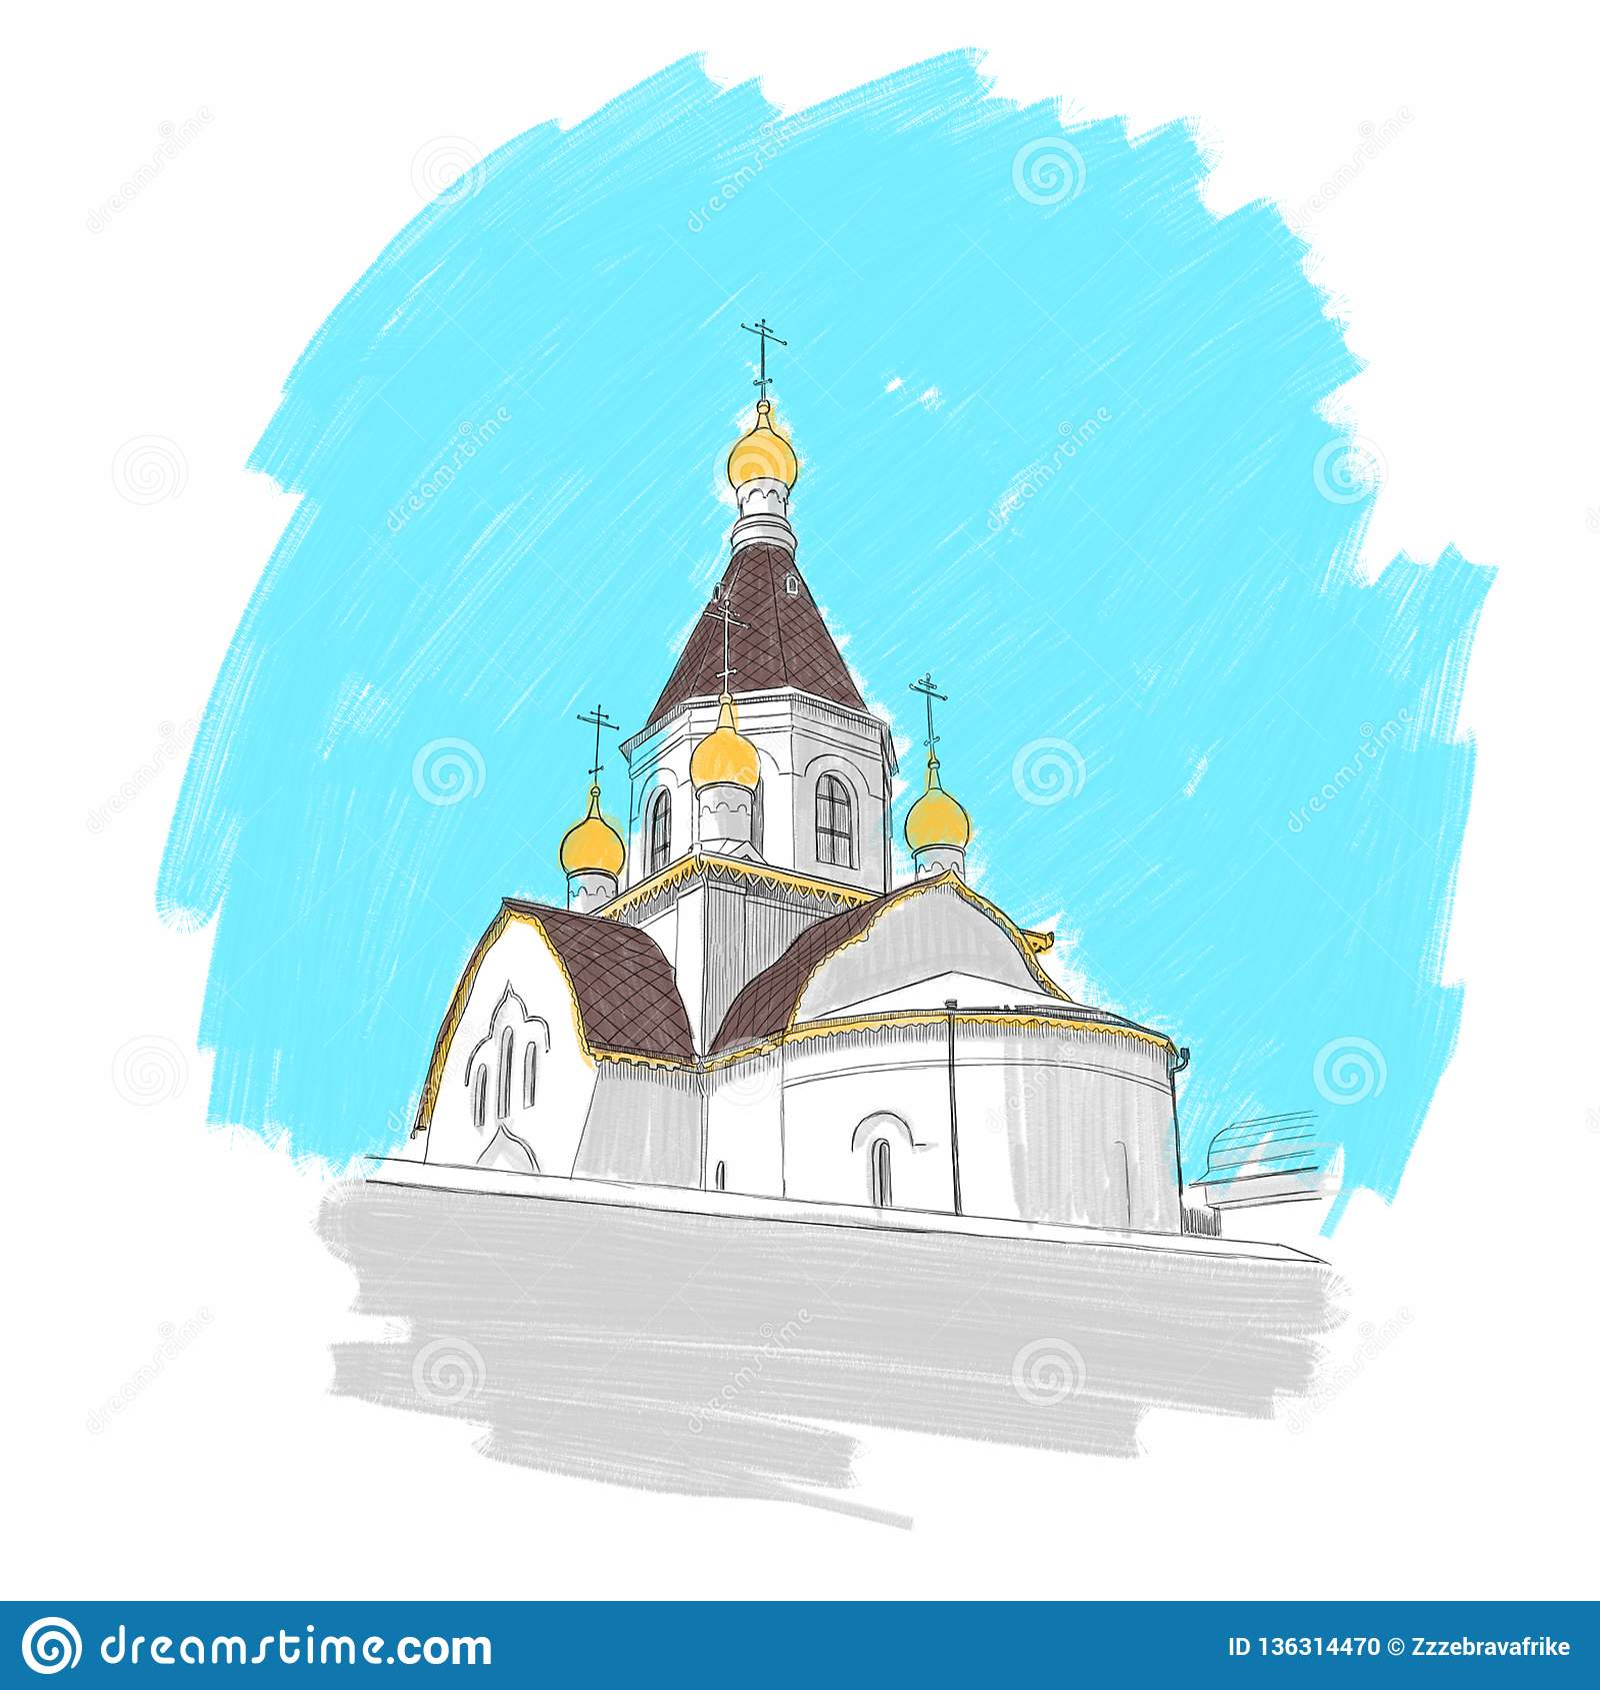 Monastery on the banks of the River in Krasnoyarsk, illustration